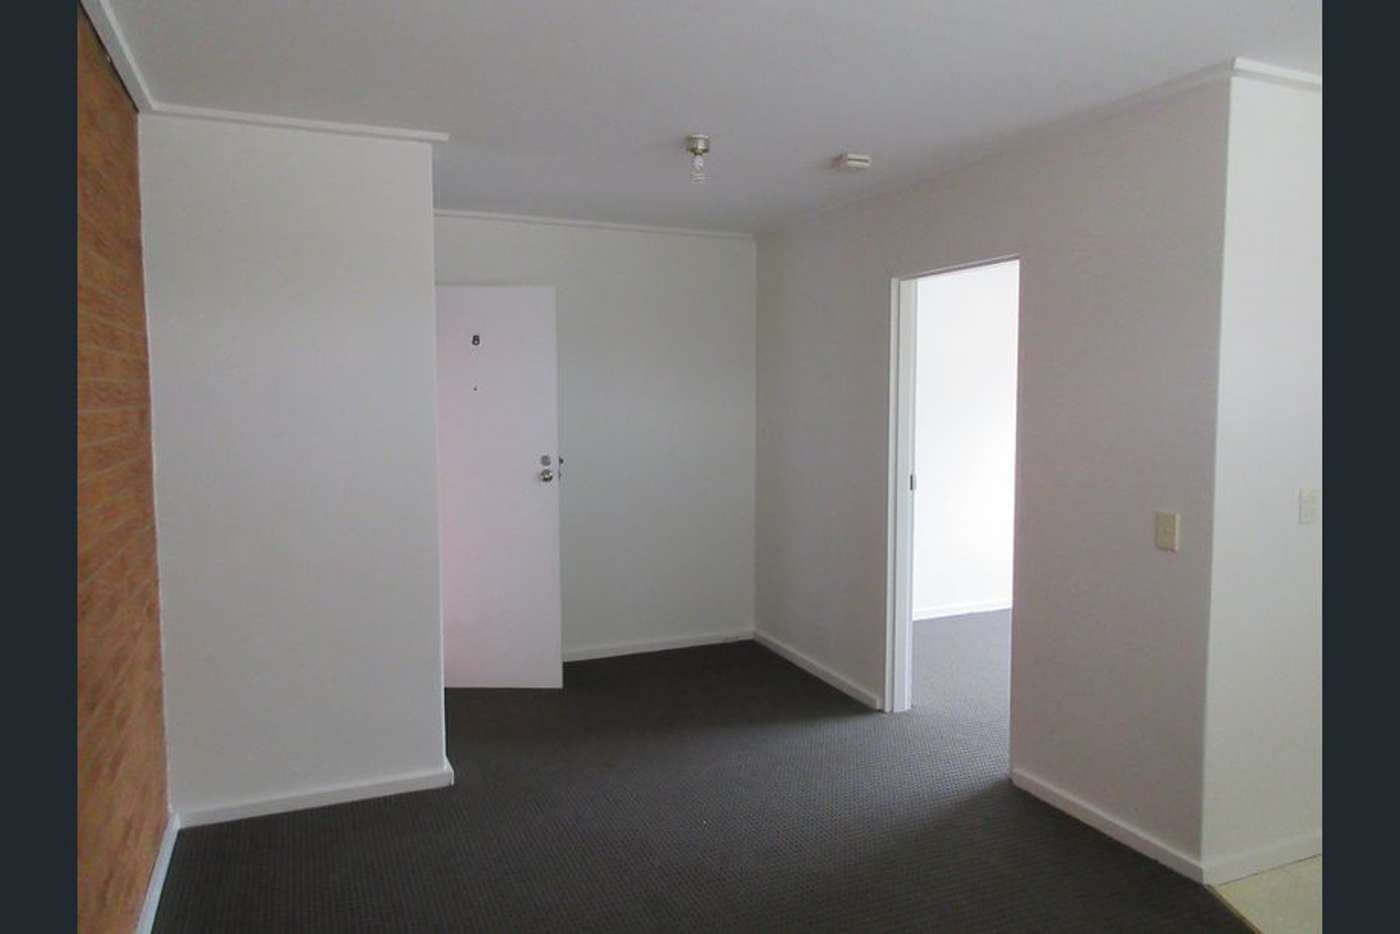 Sixth view of Homely apartment listing, 8/62 Dundas Street, Thornbury VIC 3071